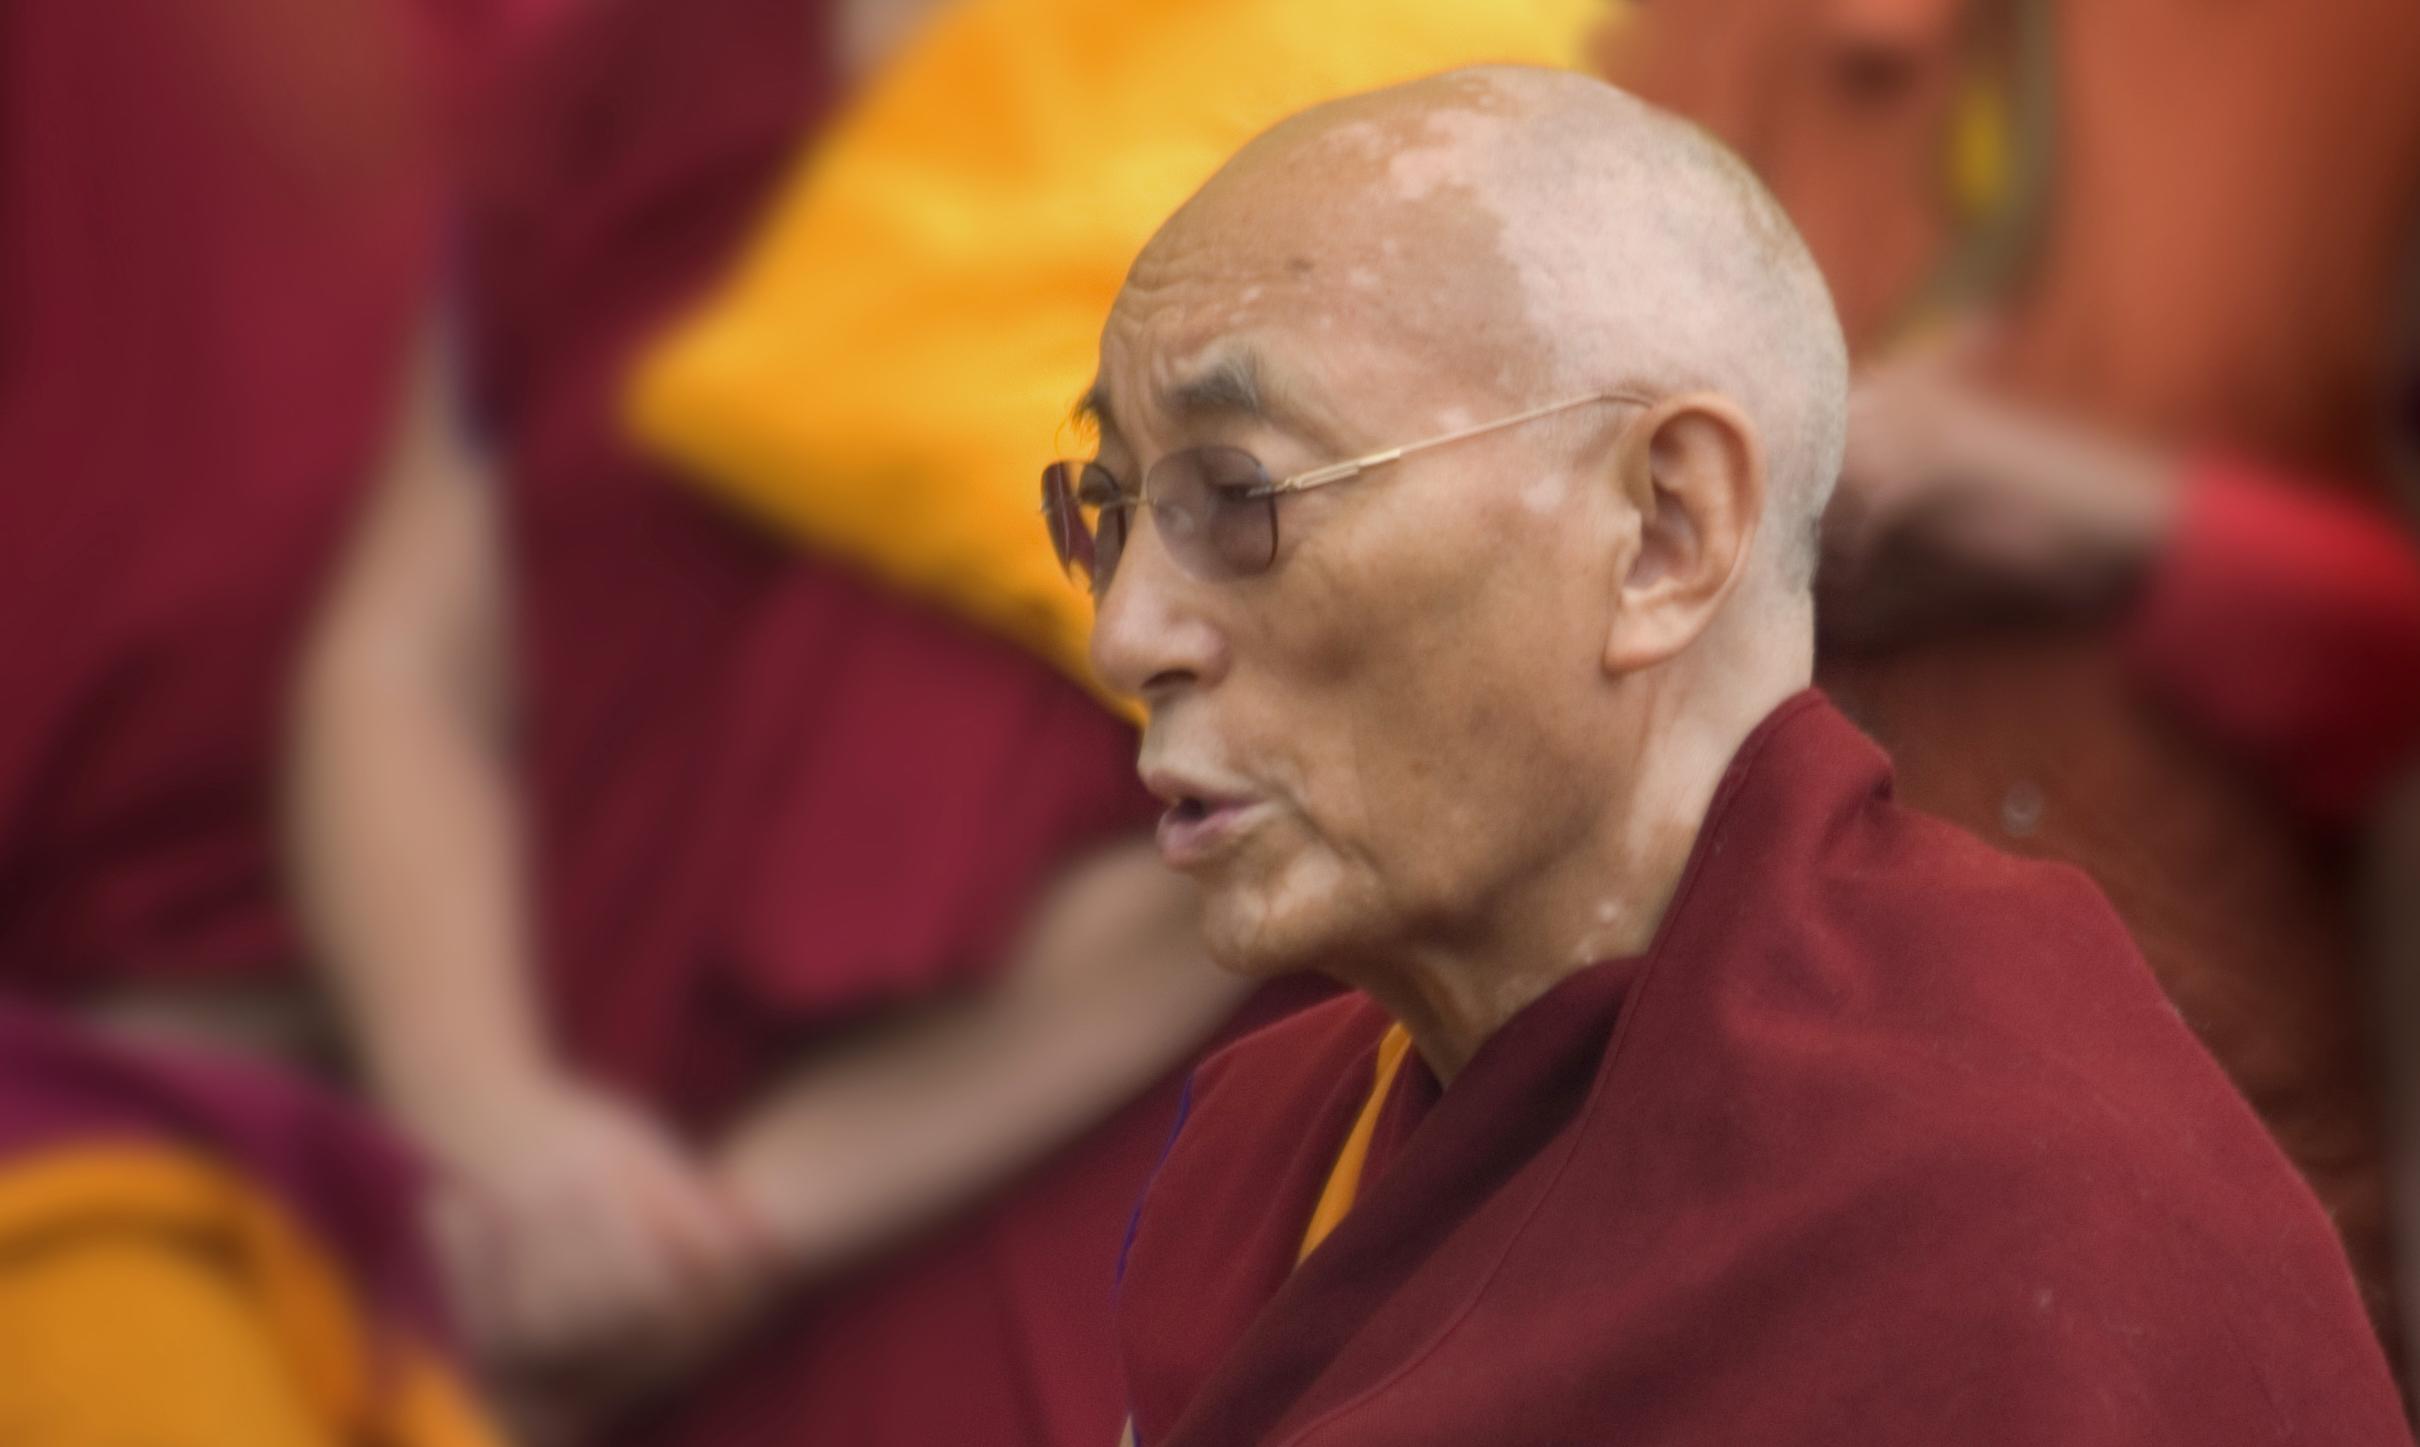 Choden-Rinpoche